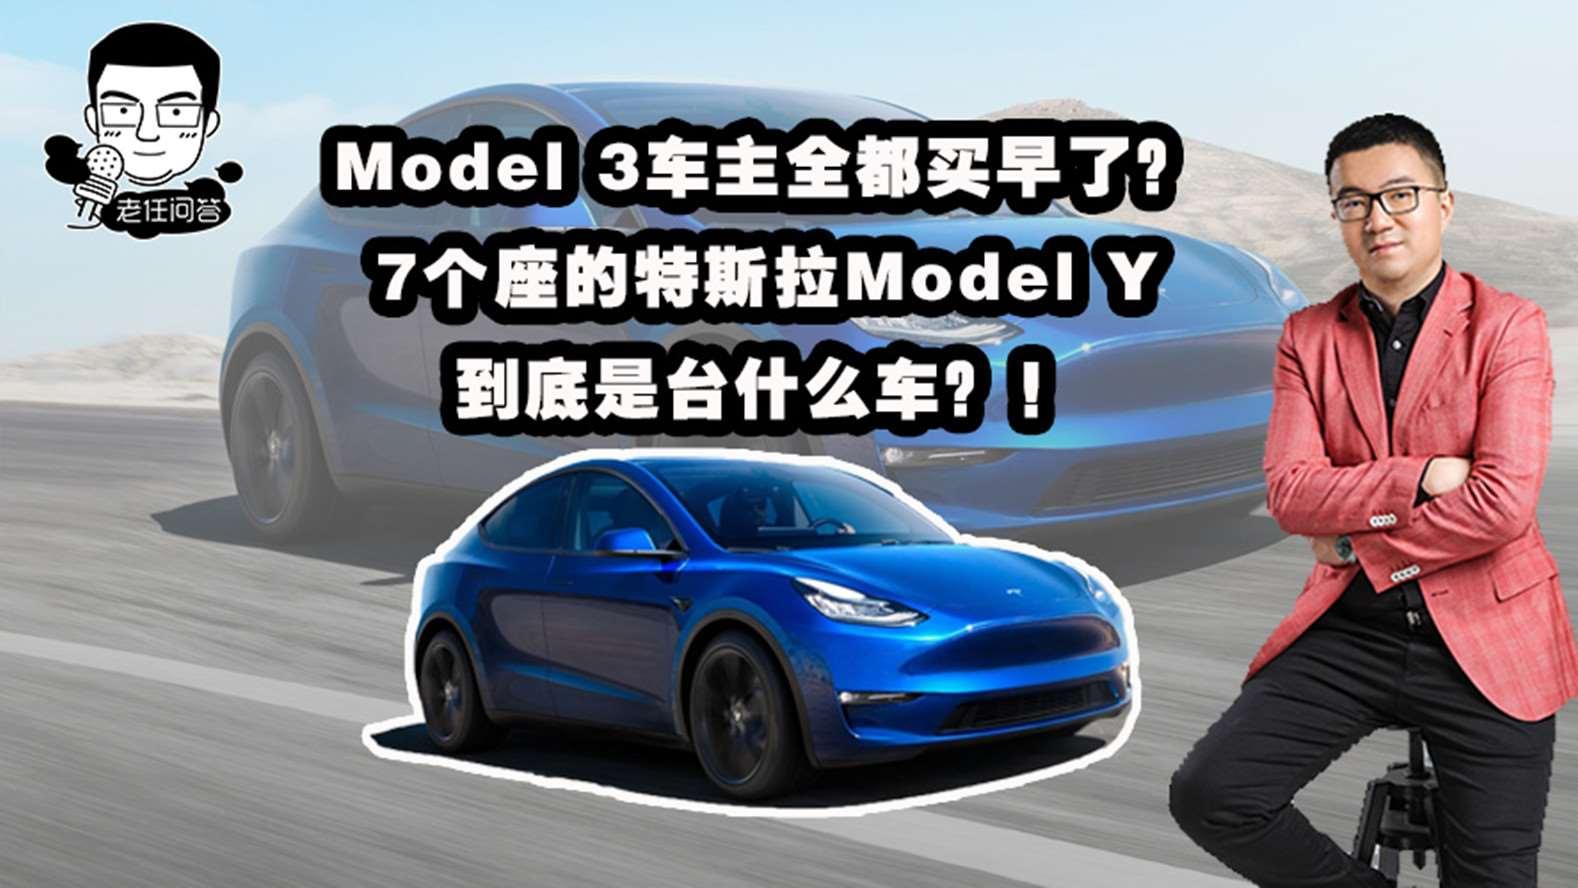 Model Y到底是台什么车?国产之后你还考虑其他车吗?